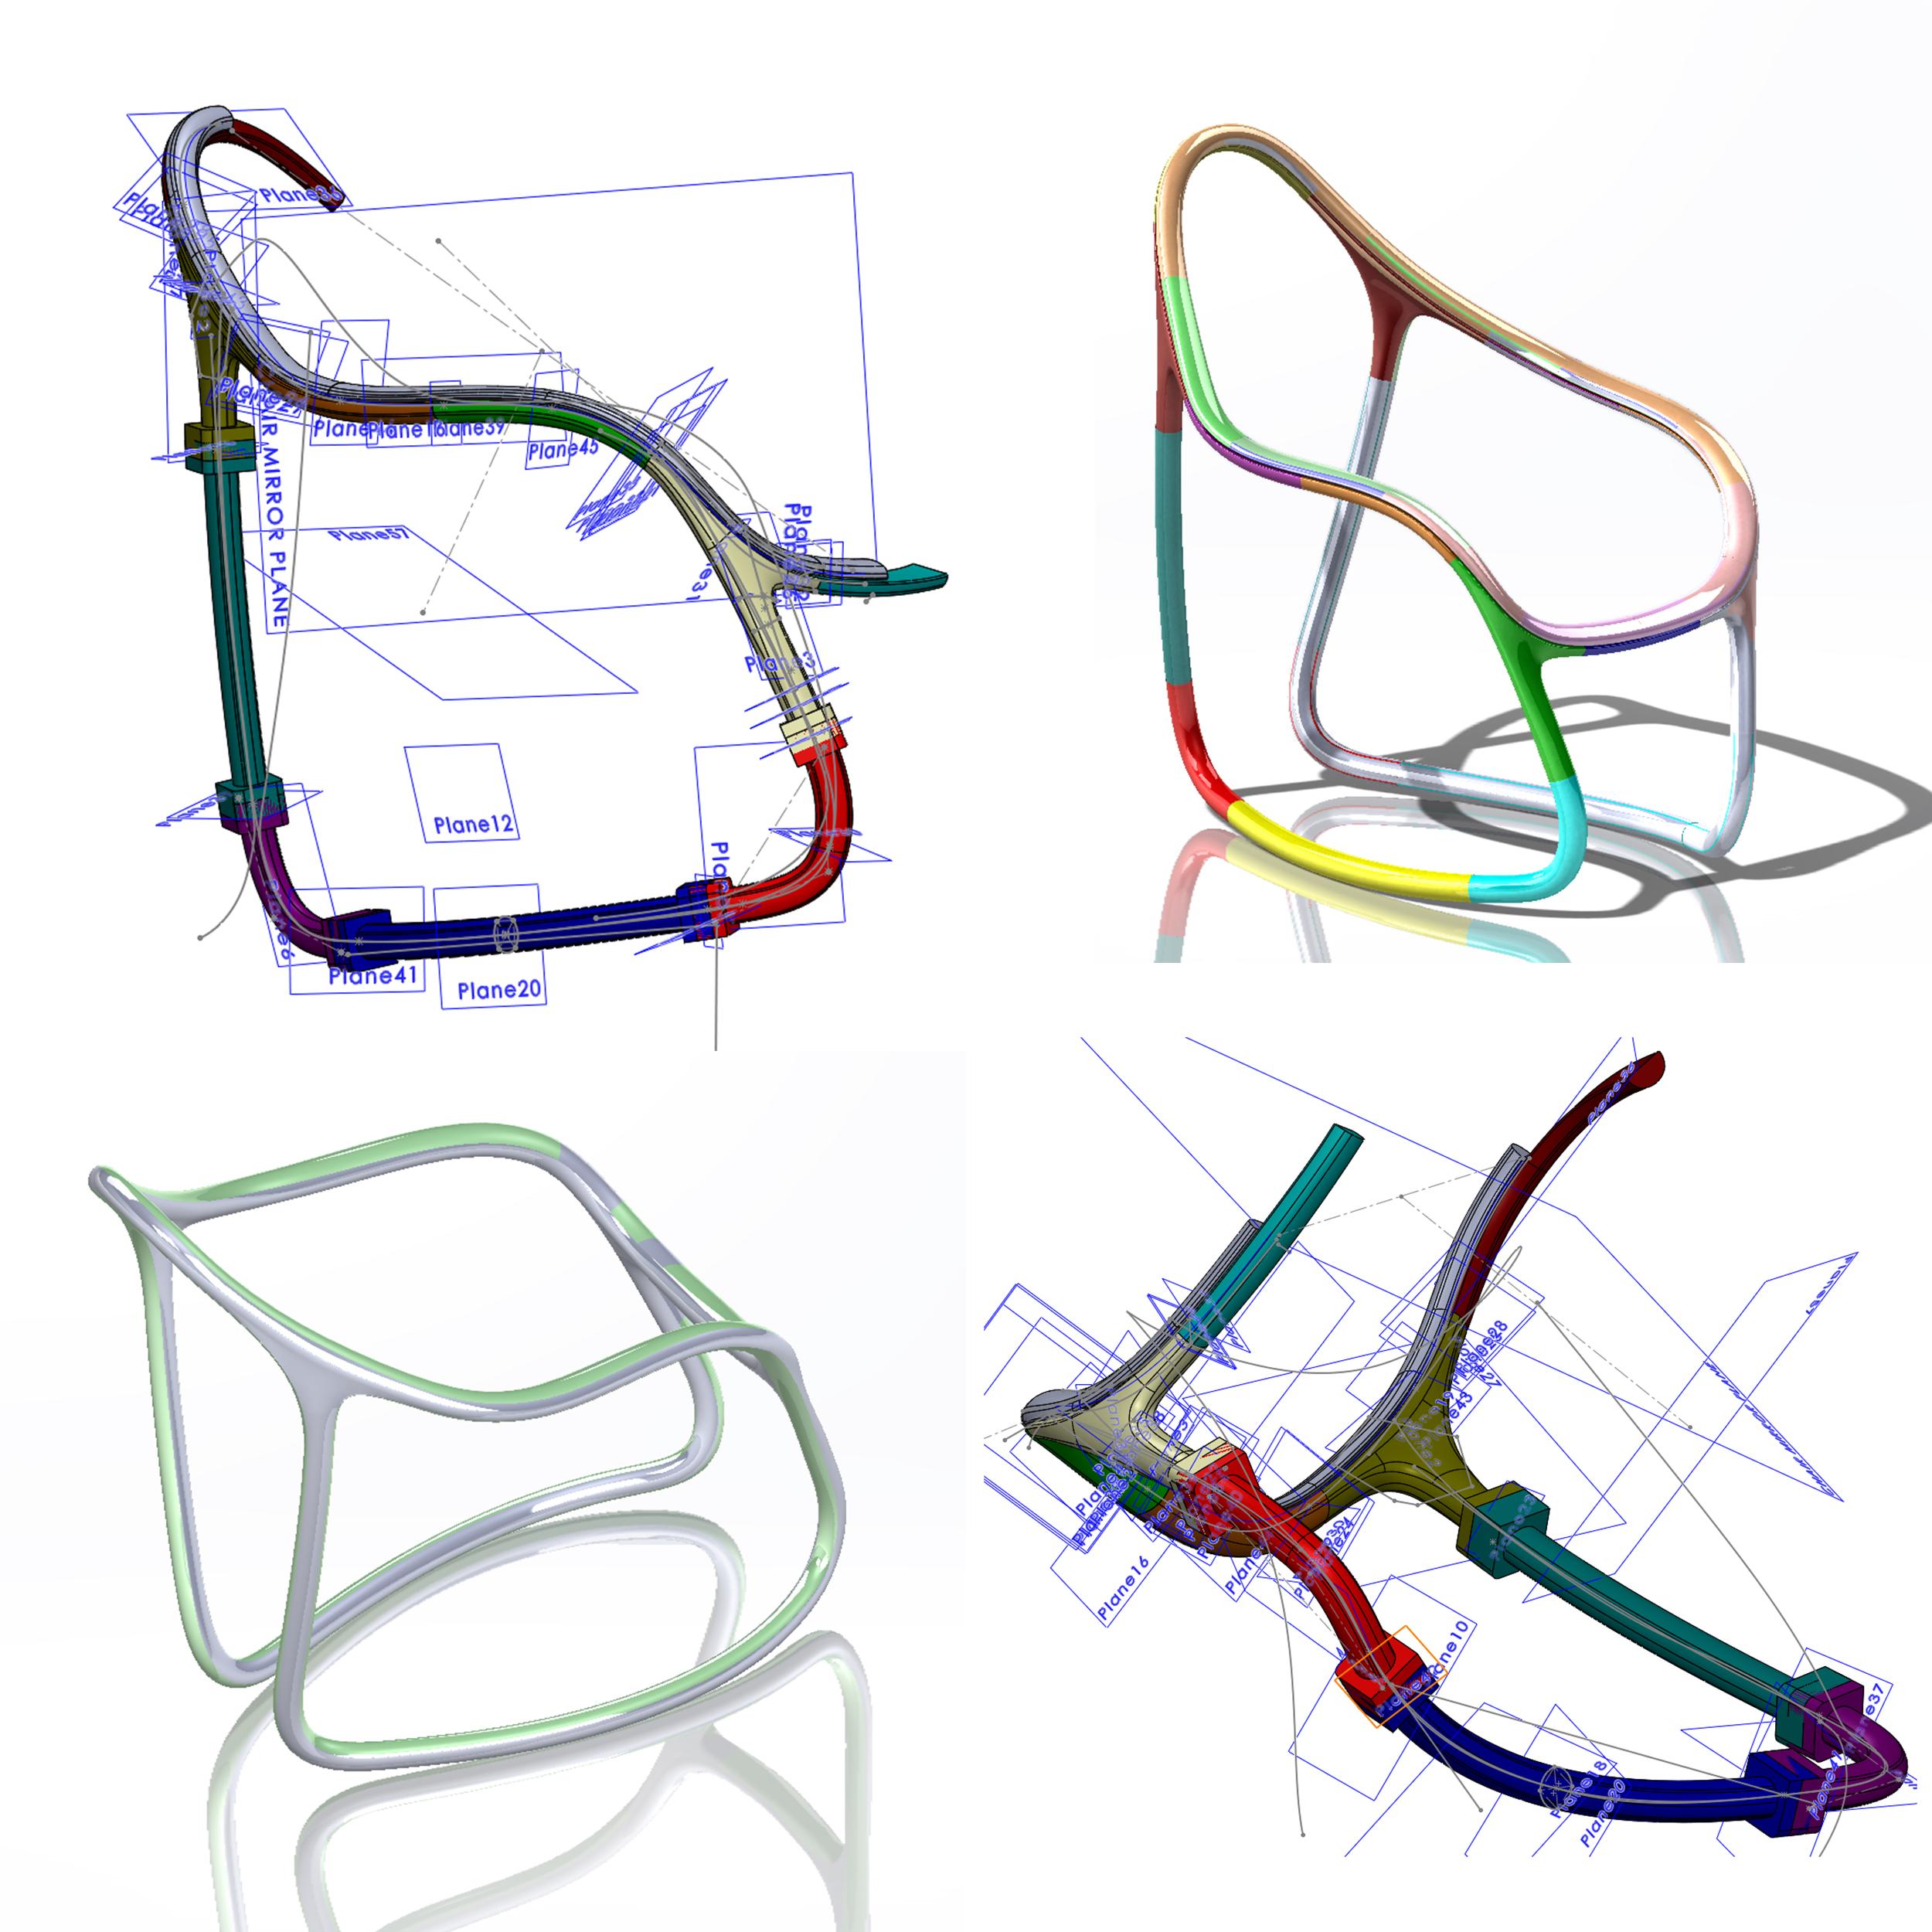 Rush Chair - Snapshots of 3D model